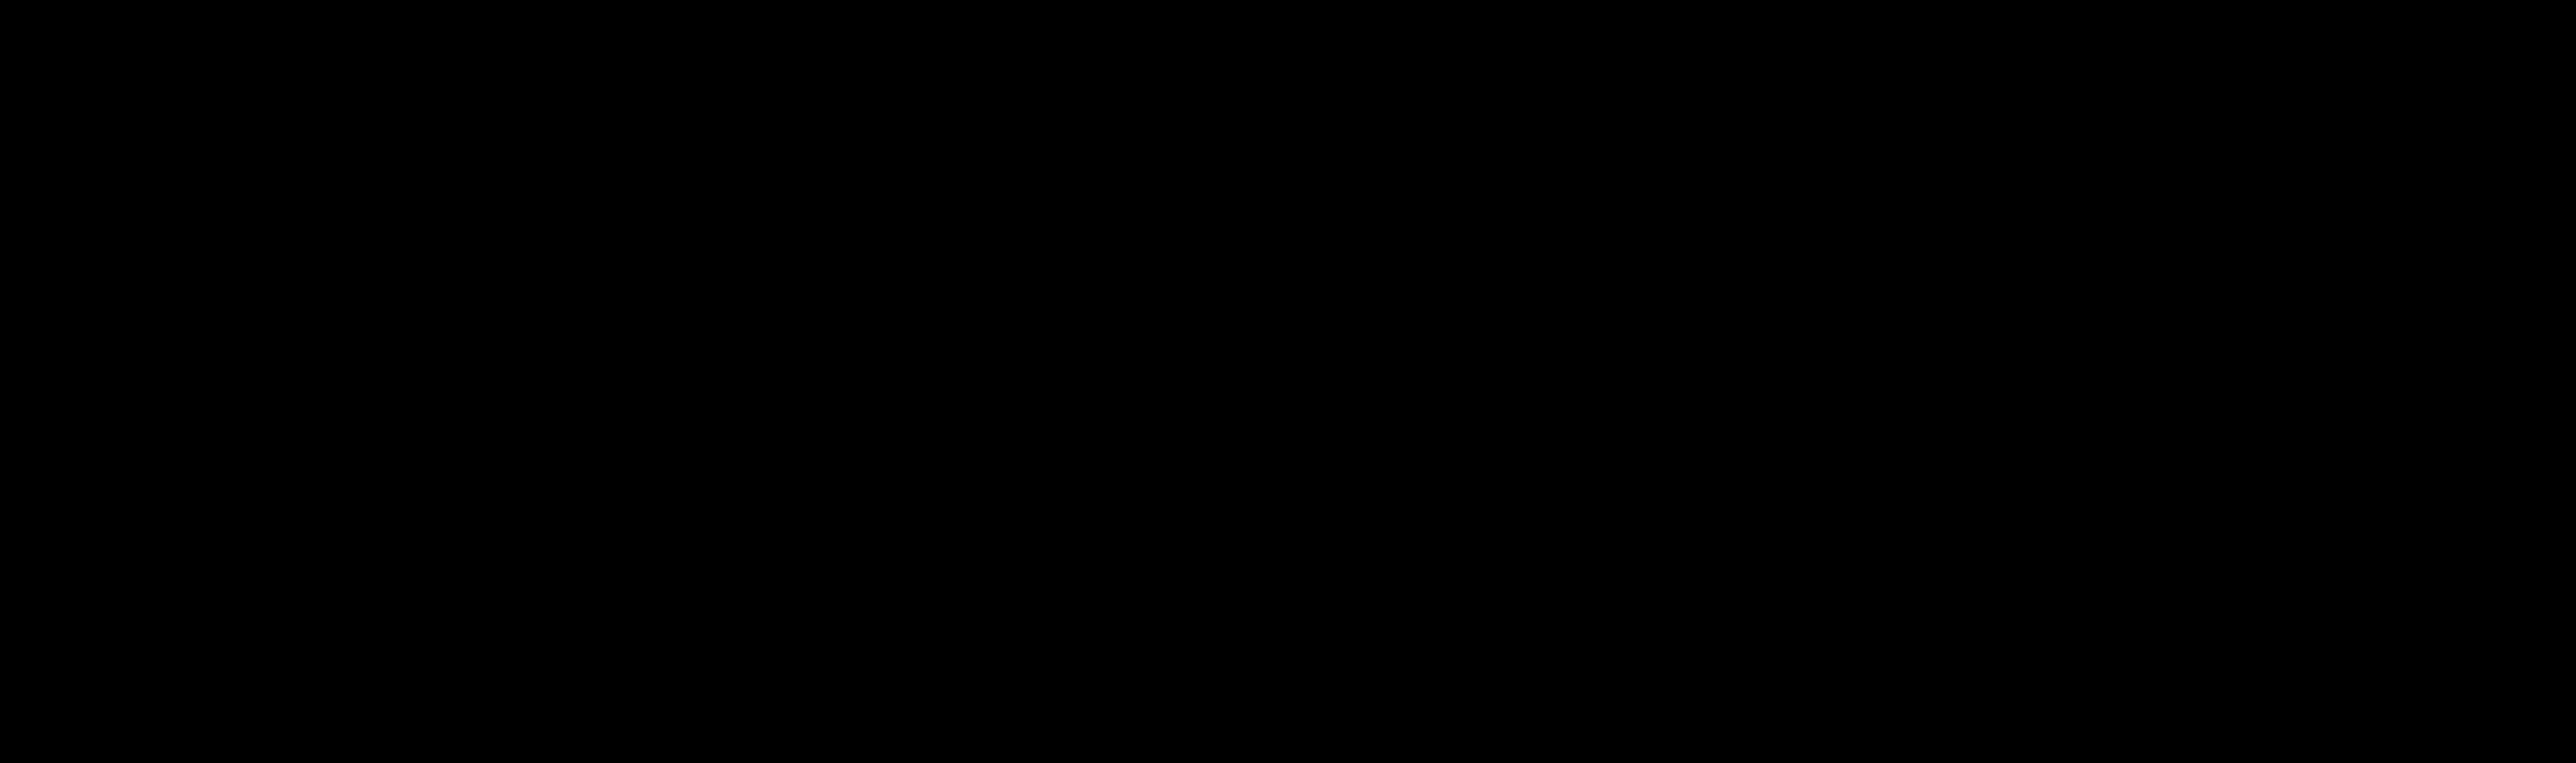 Barcode Savers BIOT